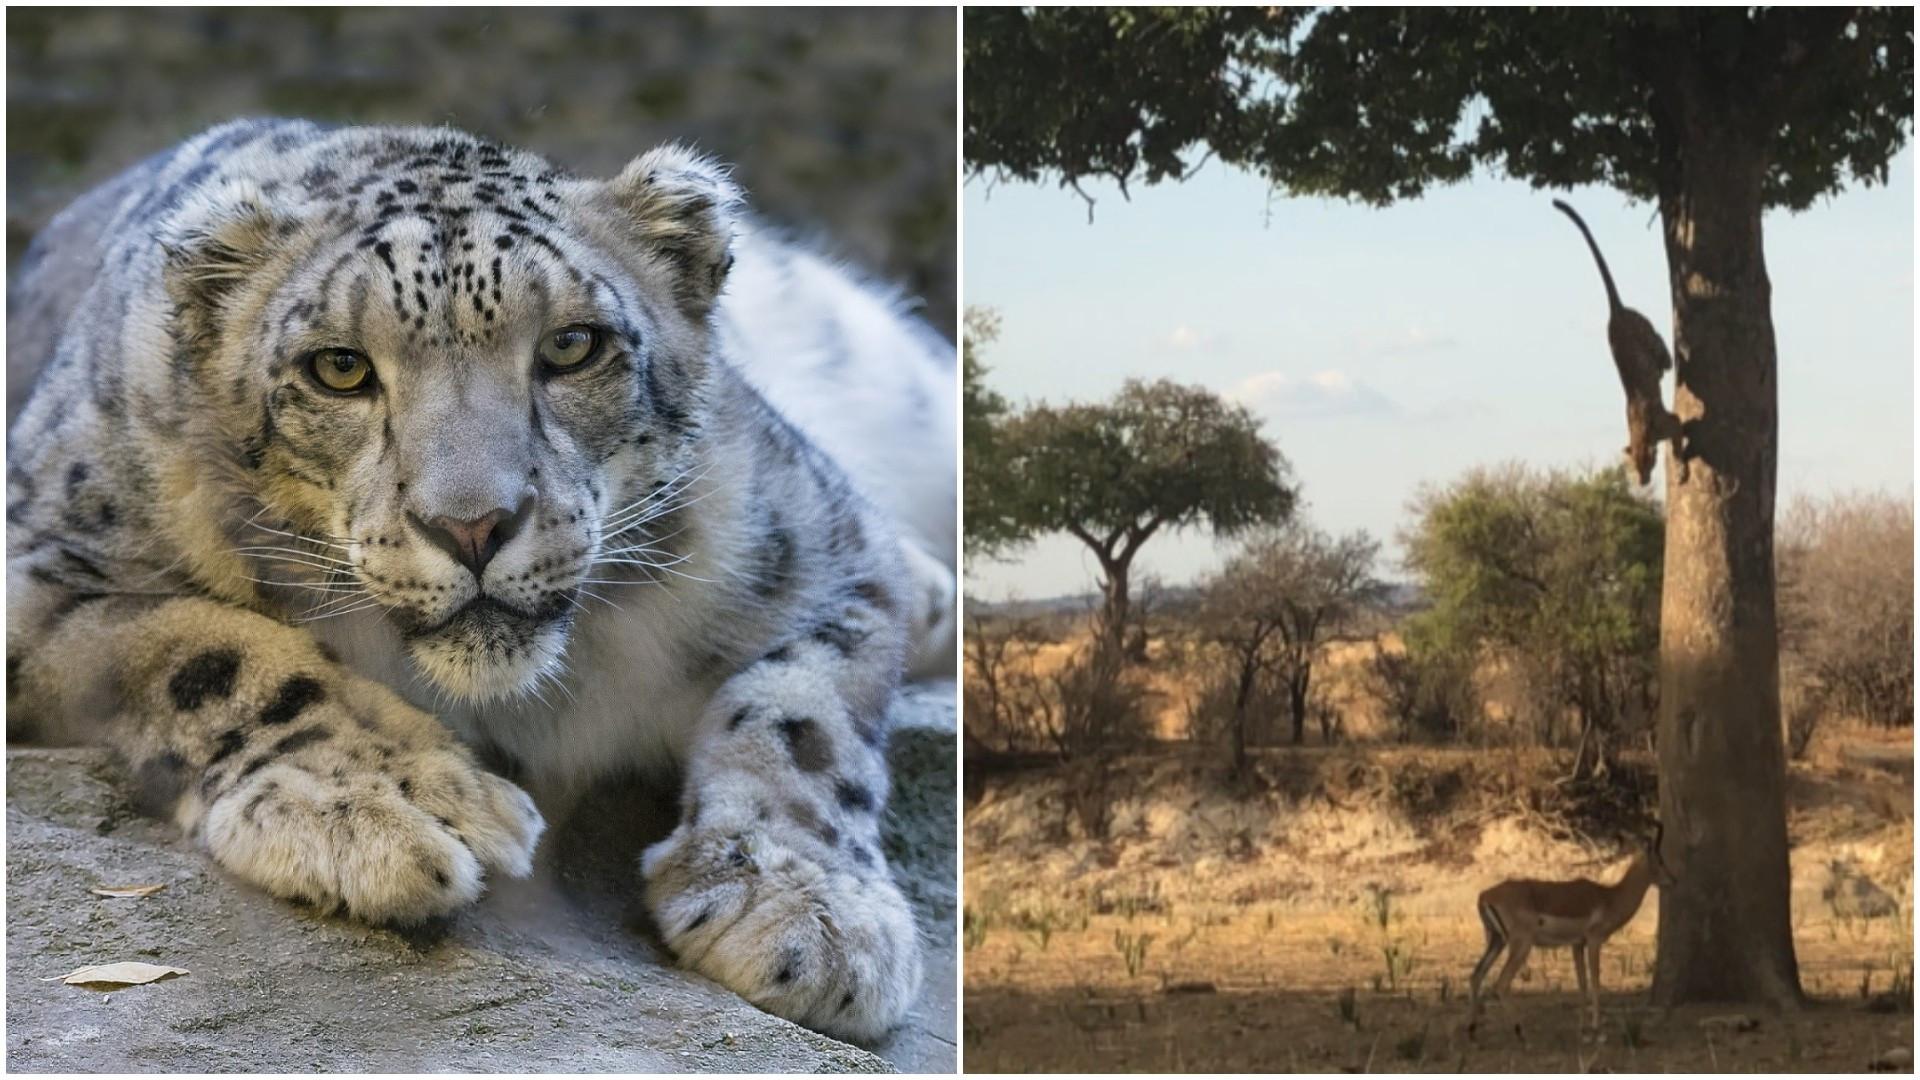 Leopardo salta de árvore para capturar presa; veja